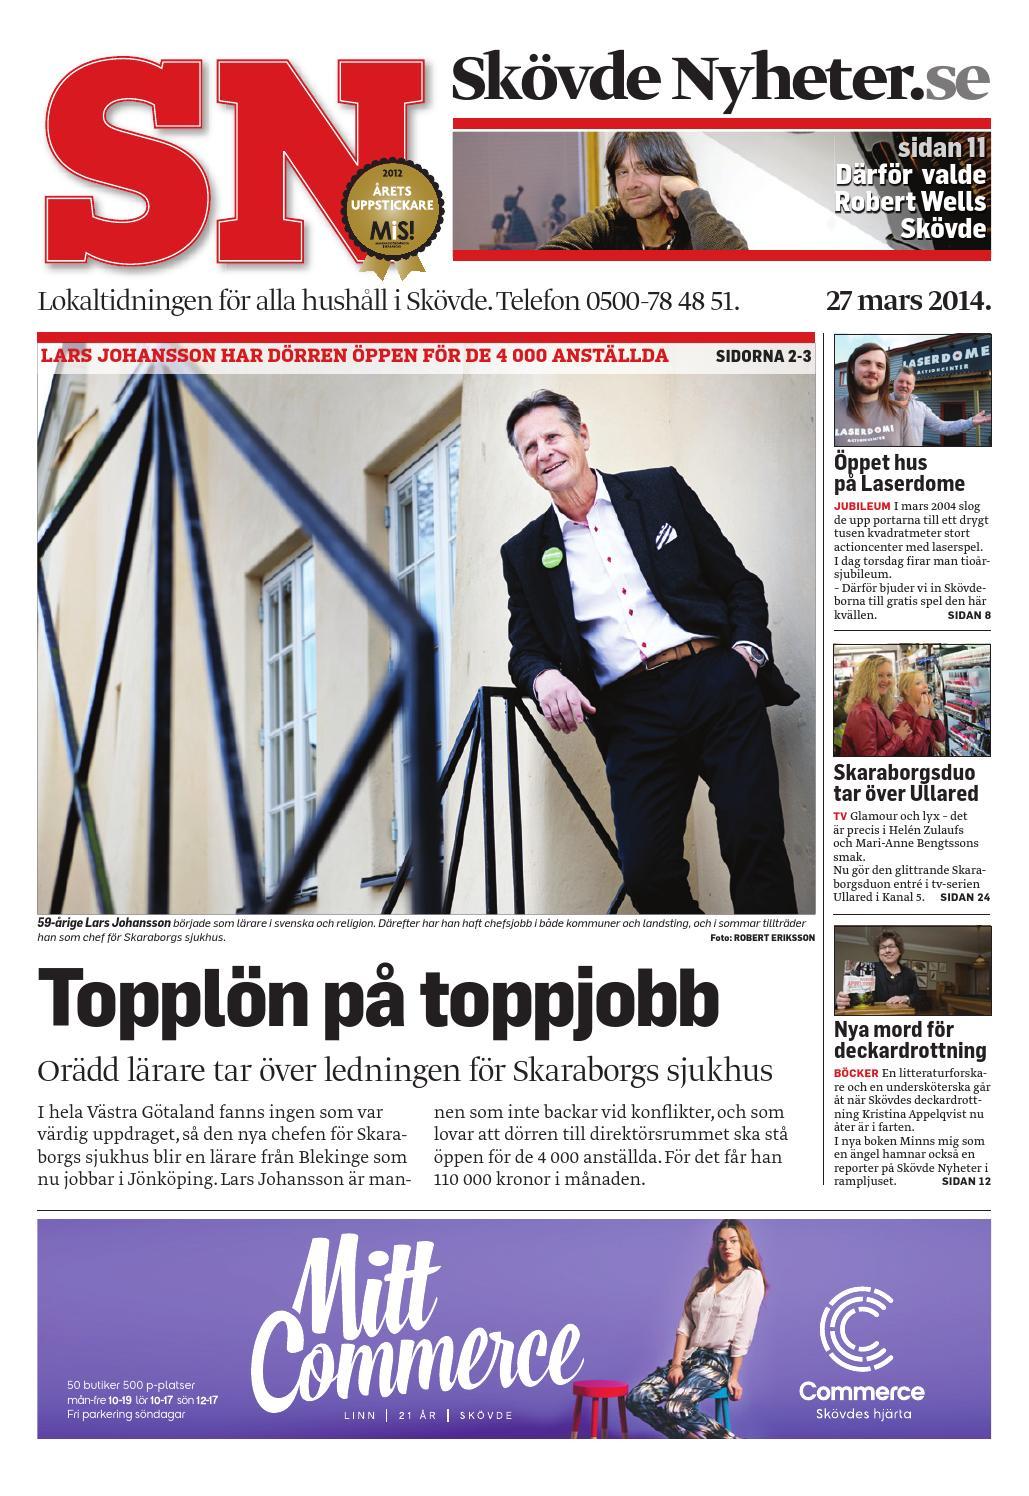 Stpen Escort - Real Escort i din stad. - Sverige Real Escort